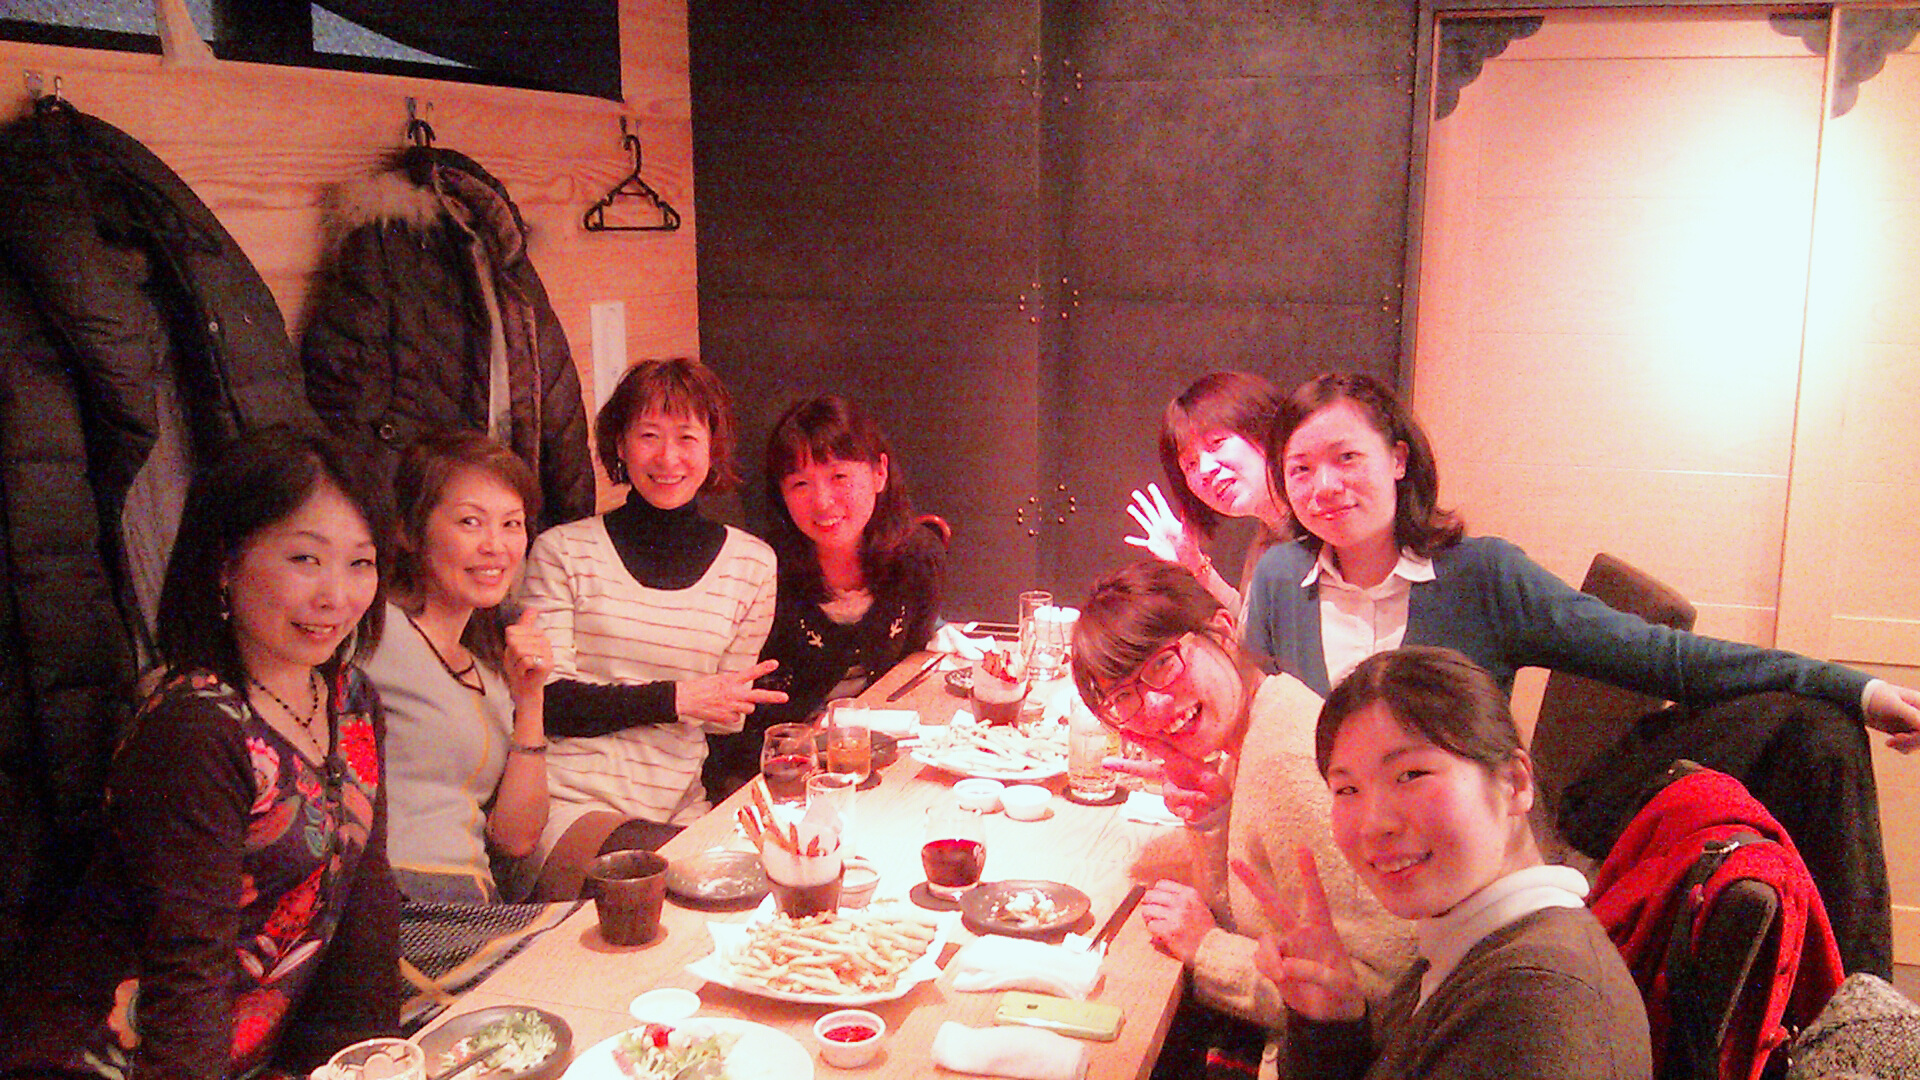 C360_2015-02-27-22-26-39-675.jpg